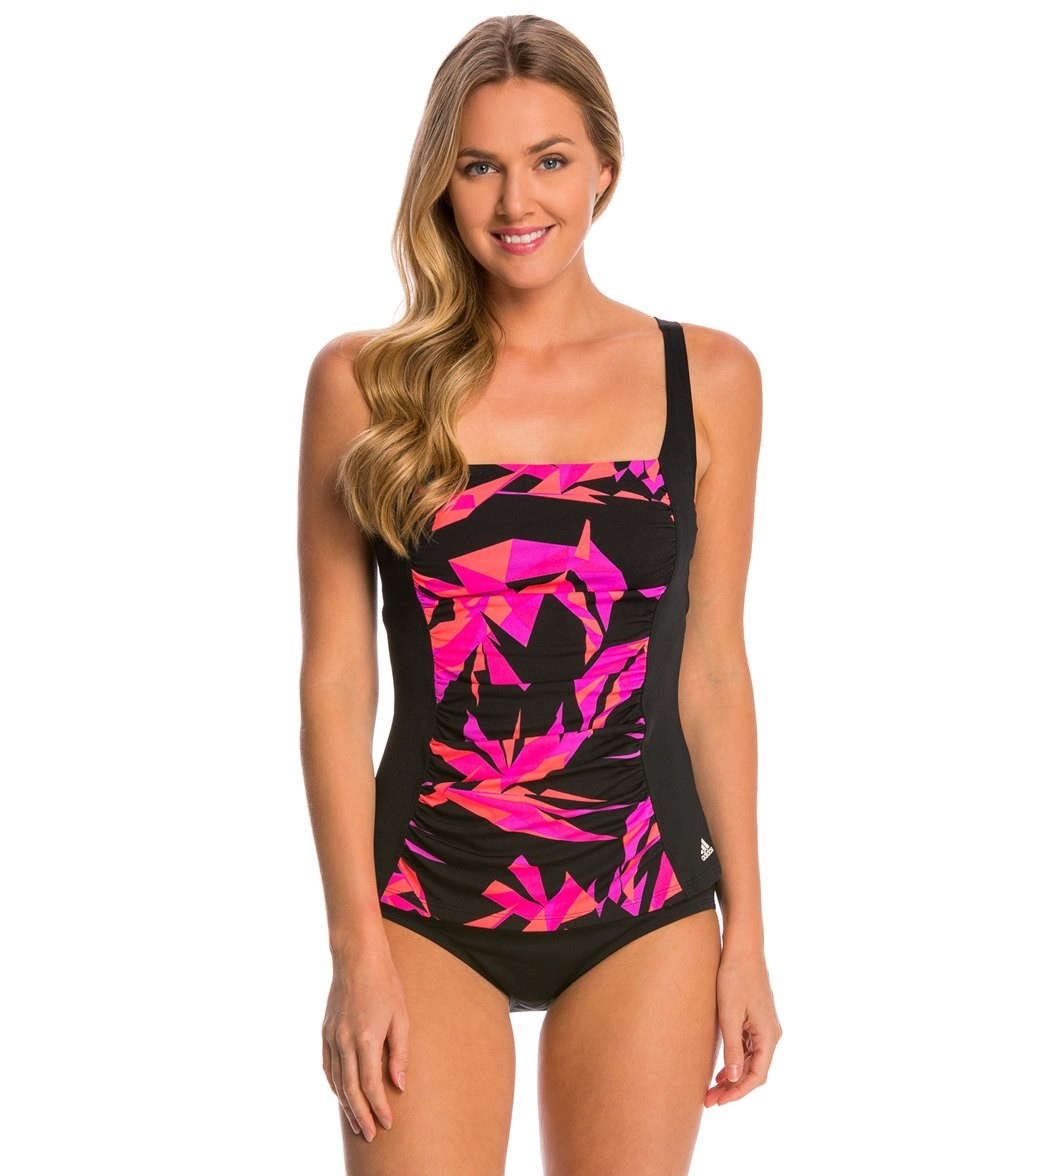 765d467b276e3 Adidas Women's Princess Seam Tankini Top at SwimOutlet.com - Free ...